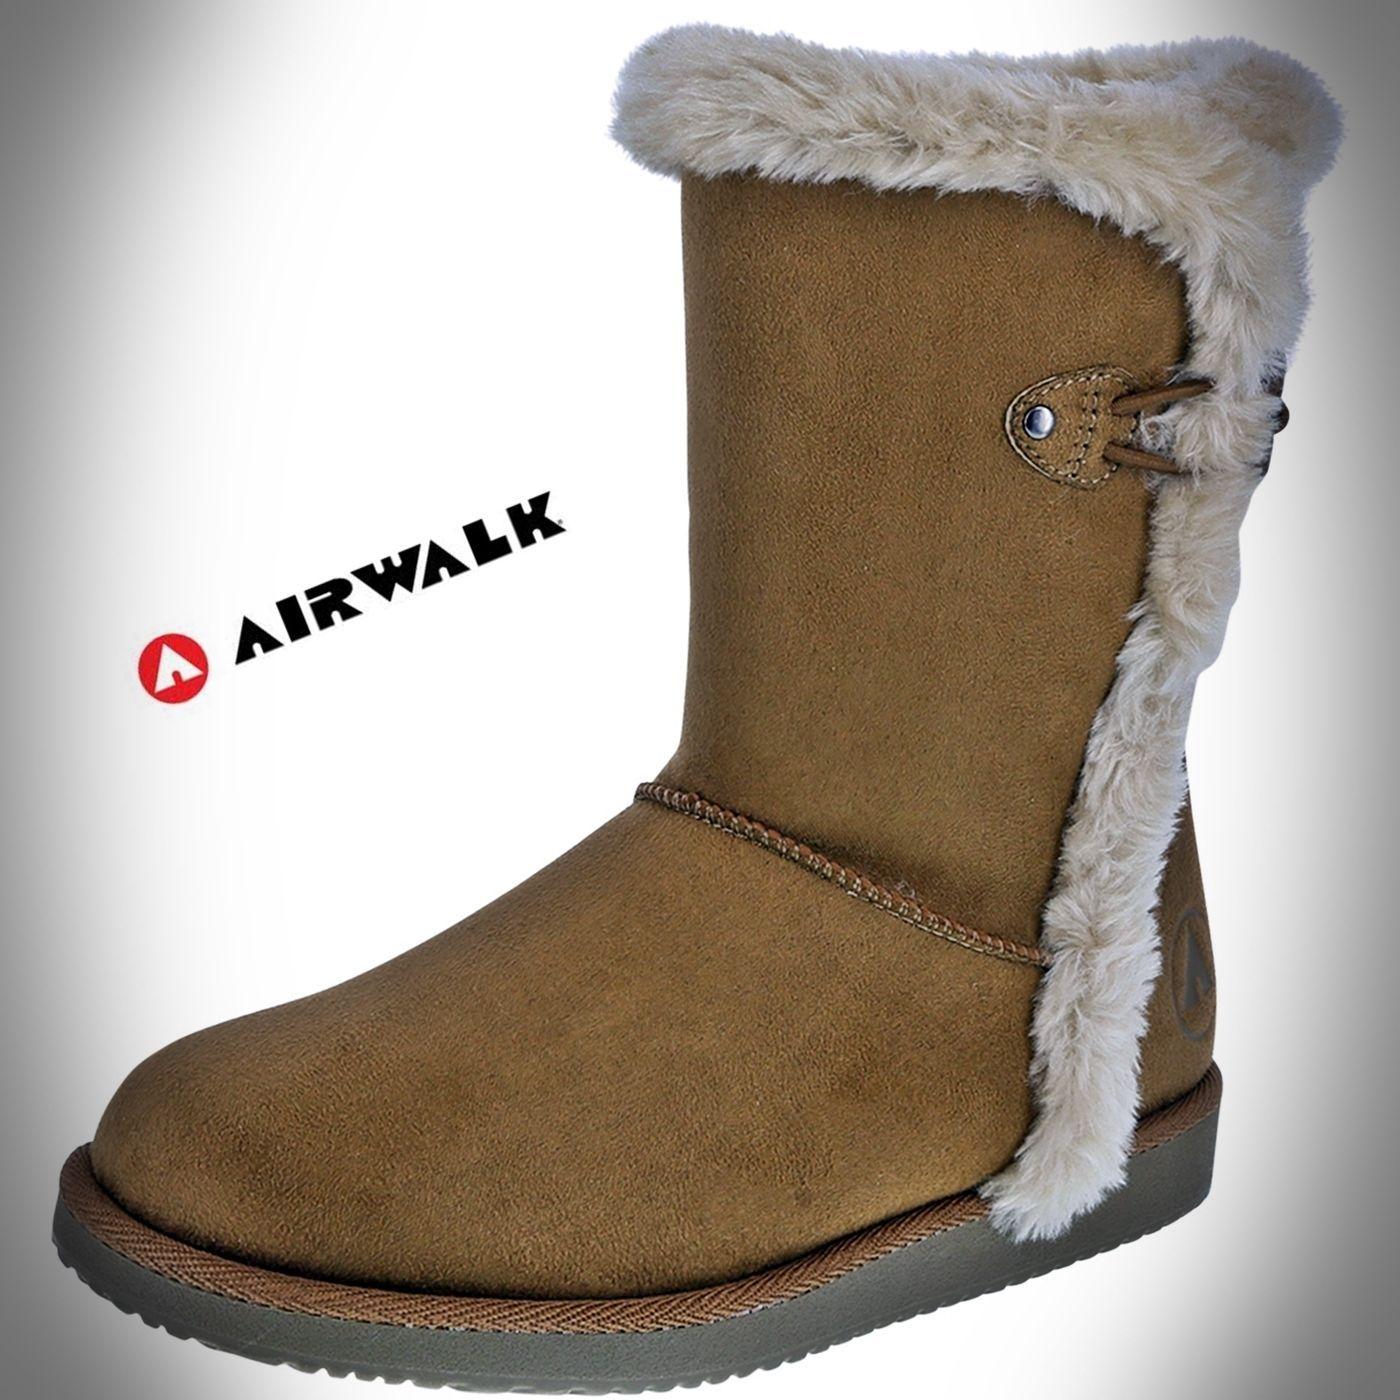 Women s Airwalk Myra Short Boots (Cognac) and 50 similar items 603febef83